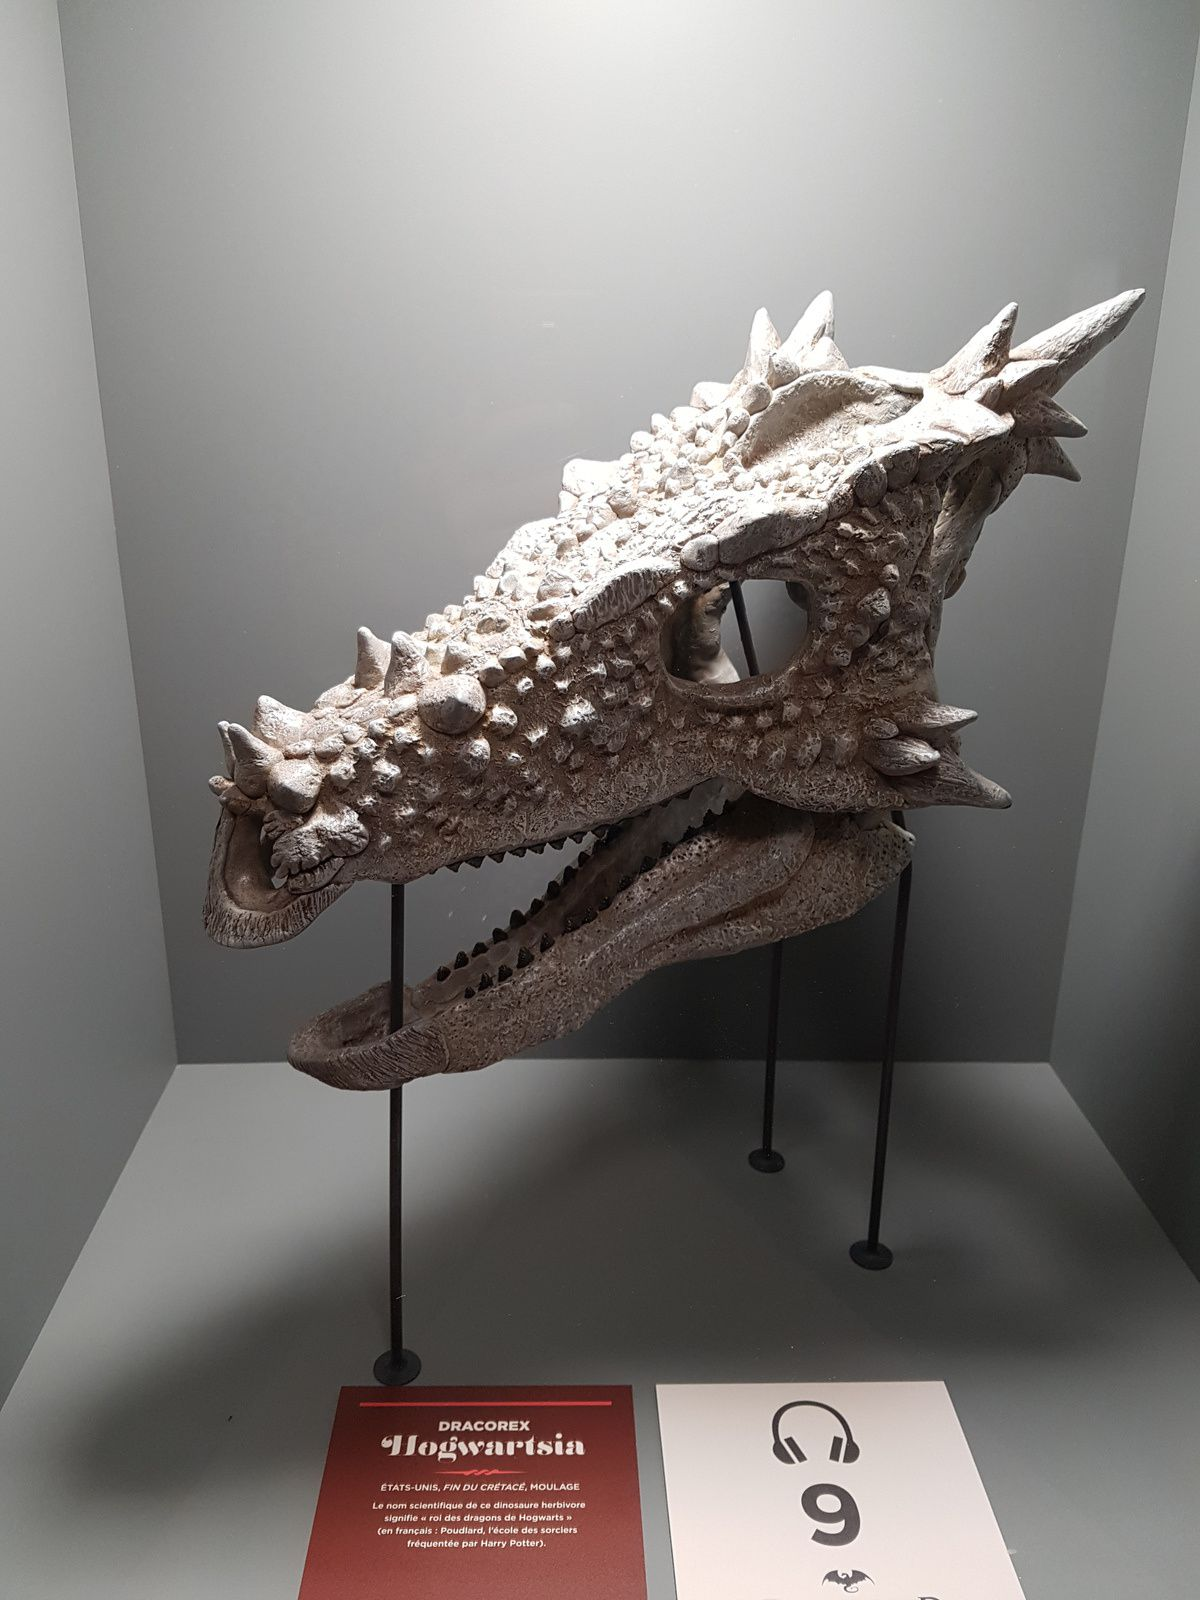 Des dragons..... aaahhhhh !!!!